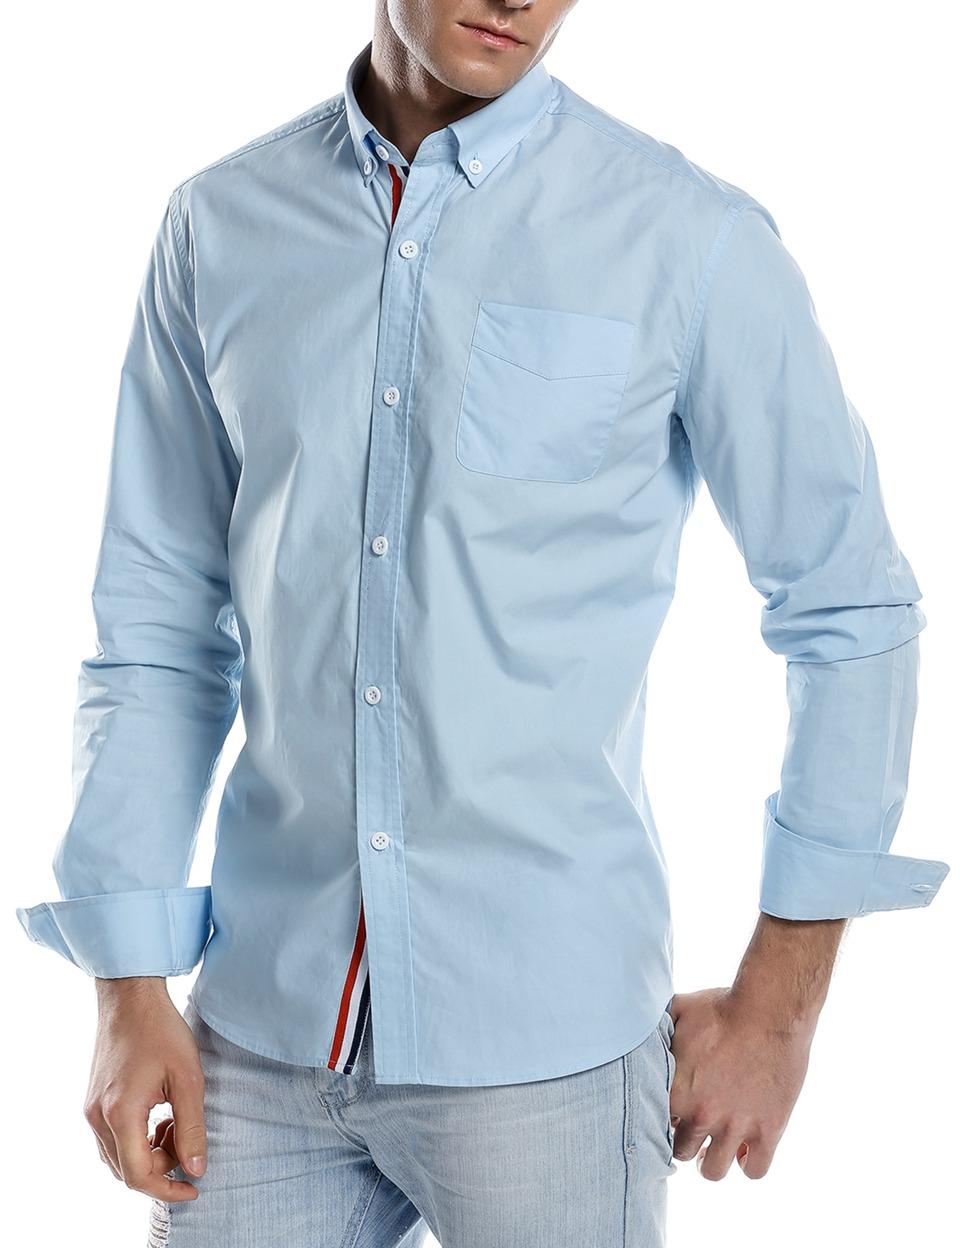 shirt (19)